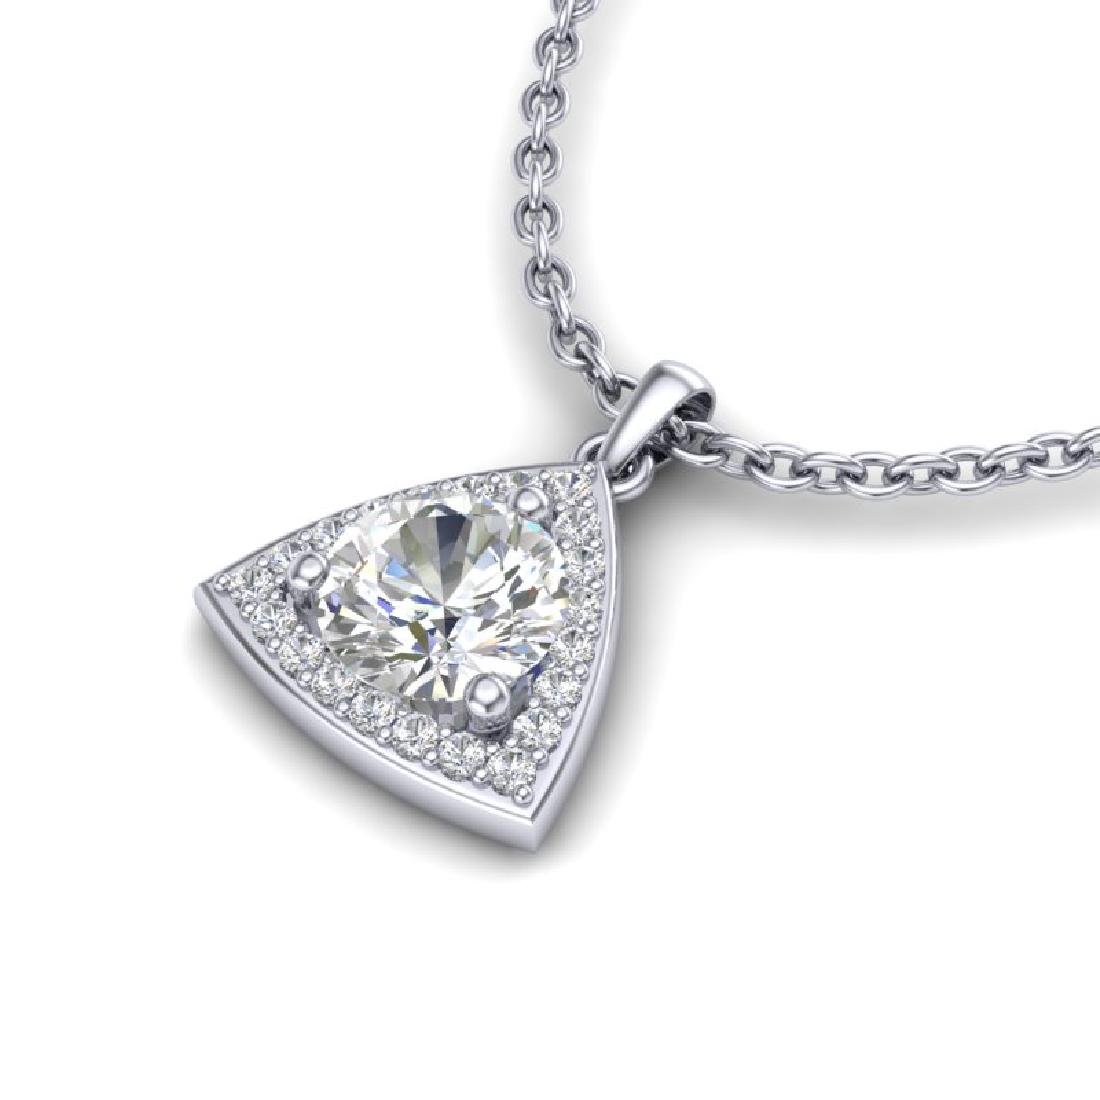 1.50 CTW VS/SI Diamond Necklace 18K White Gold - 2